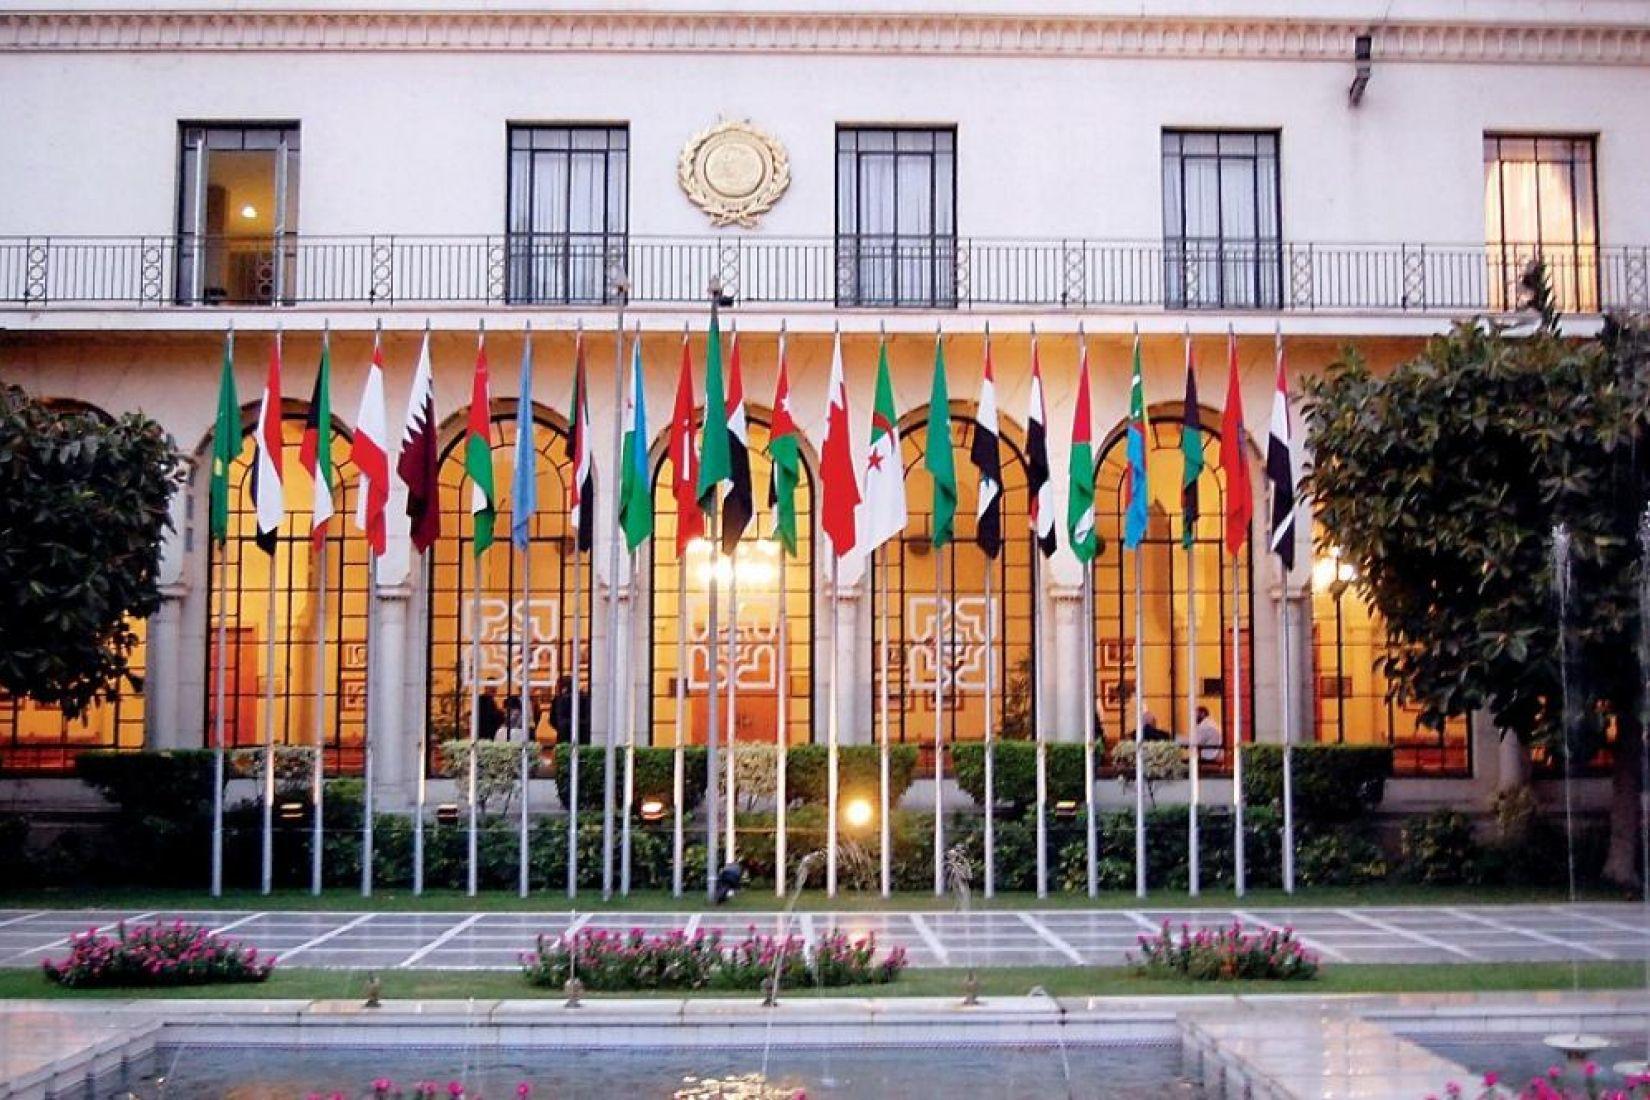 The Arab League (AFP)